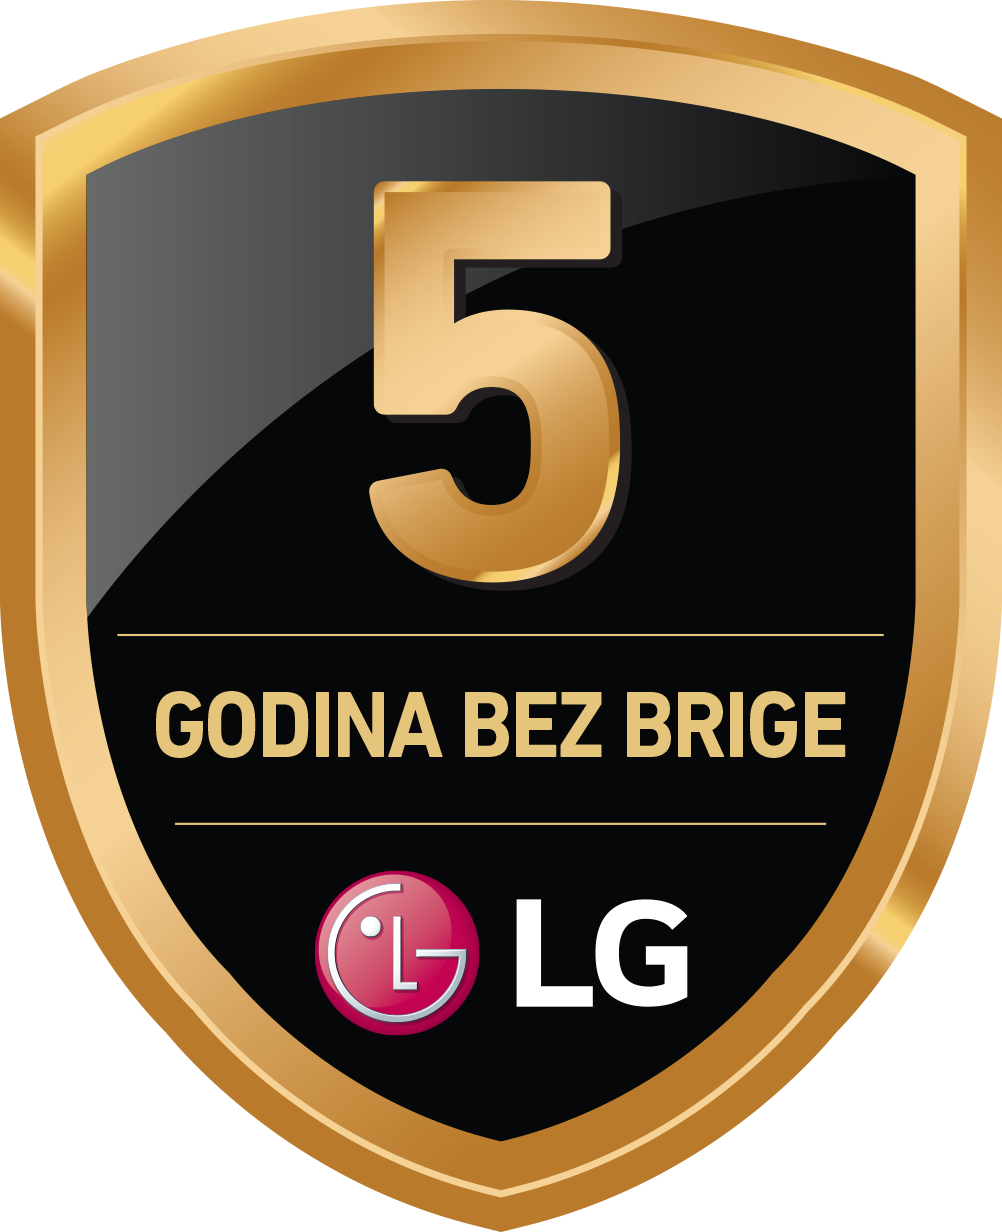 LG 5 Godina